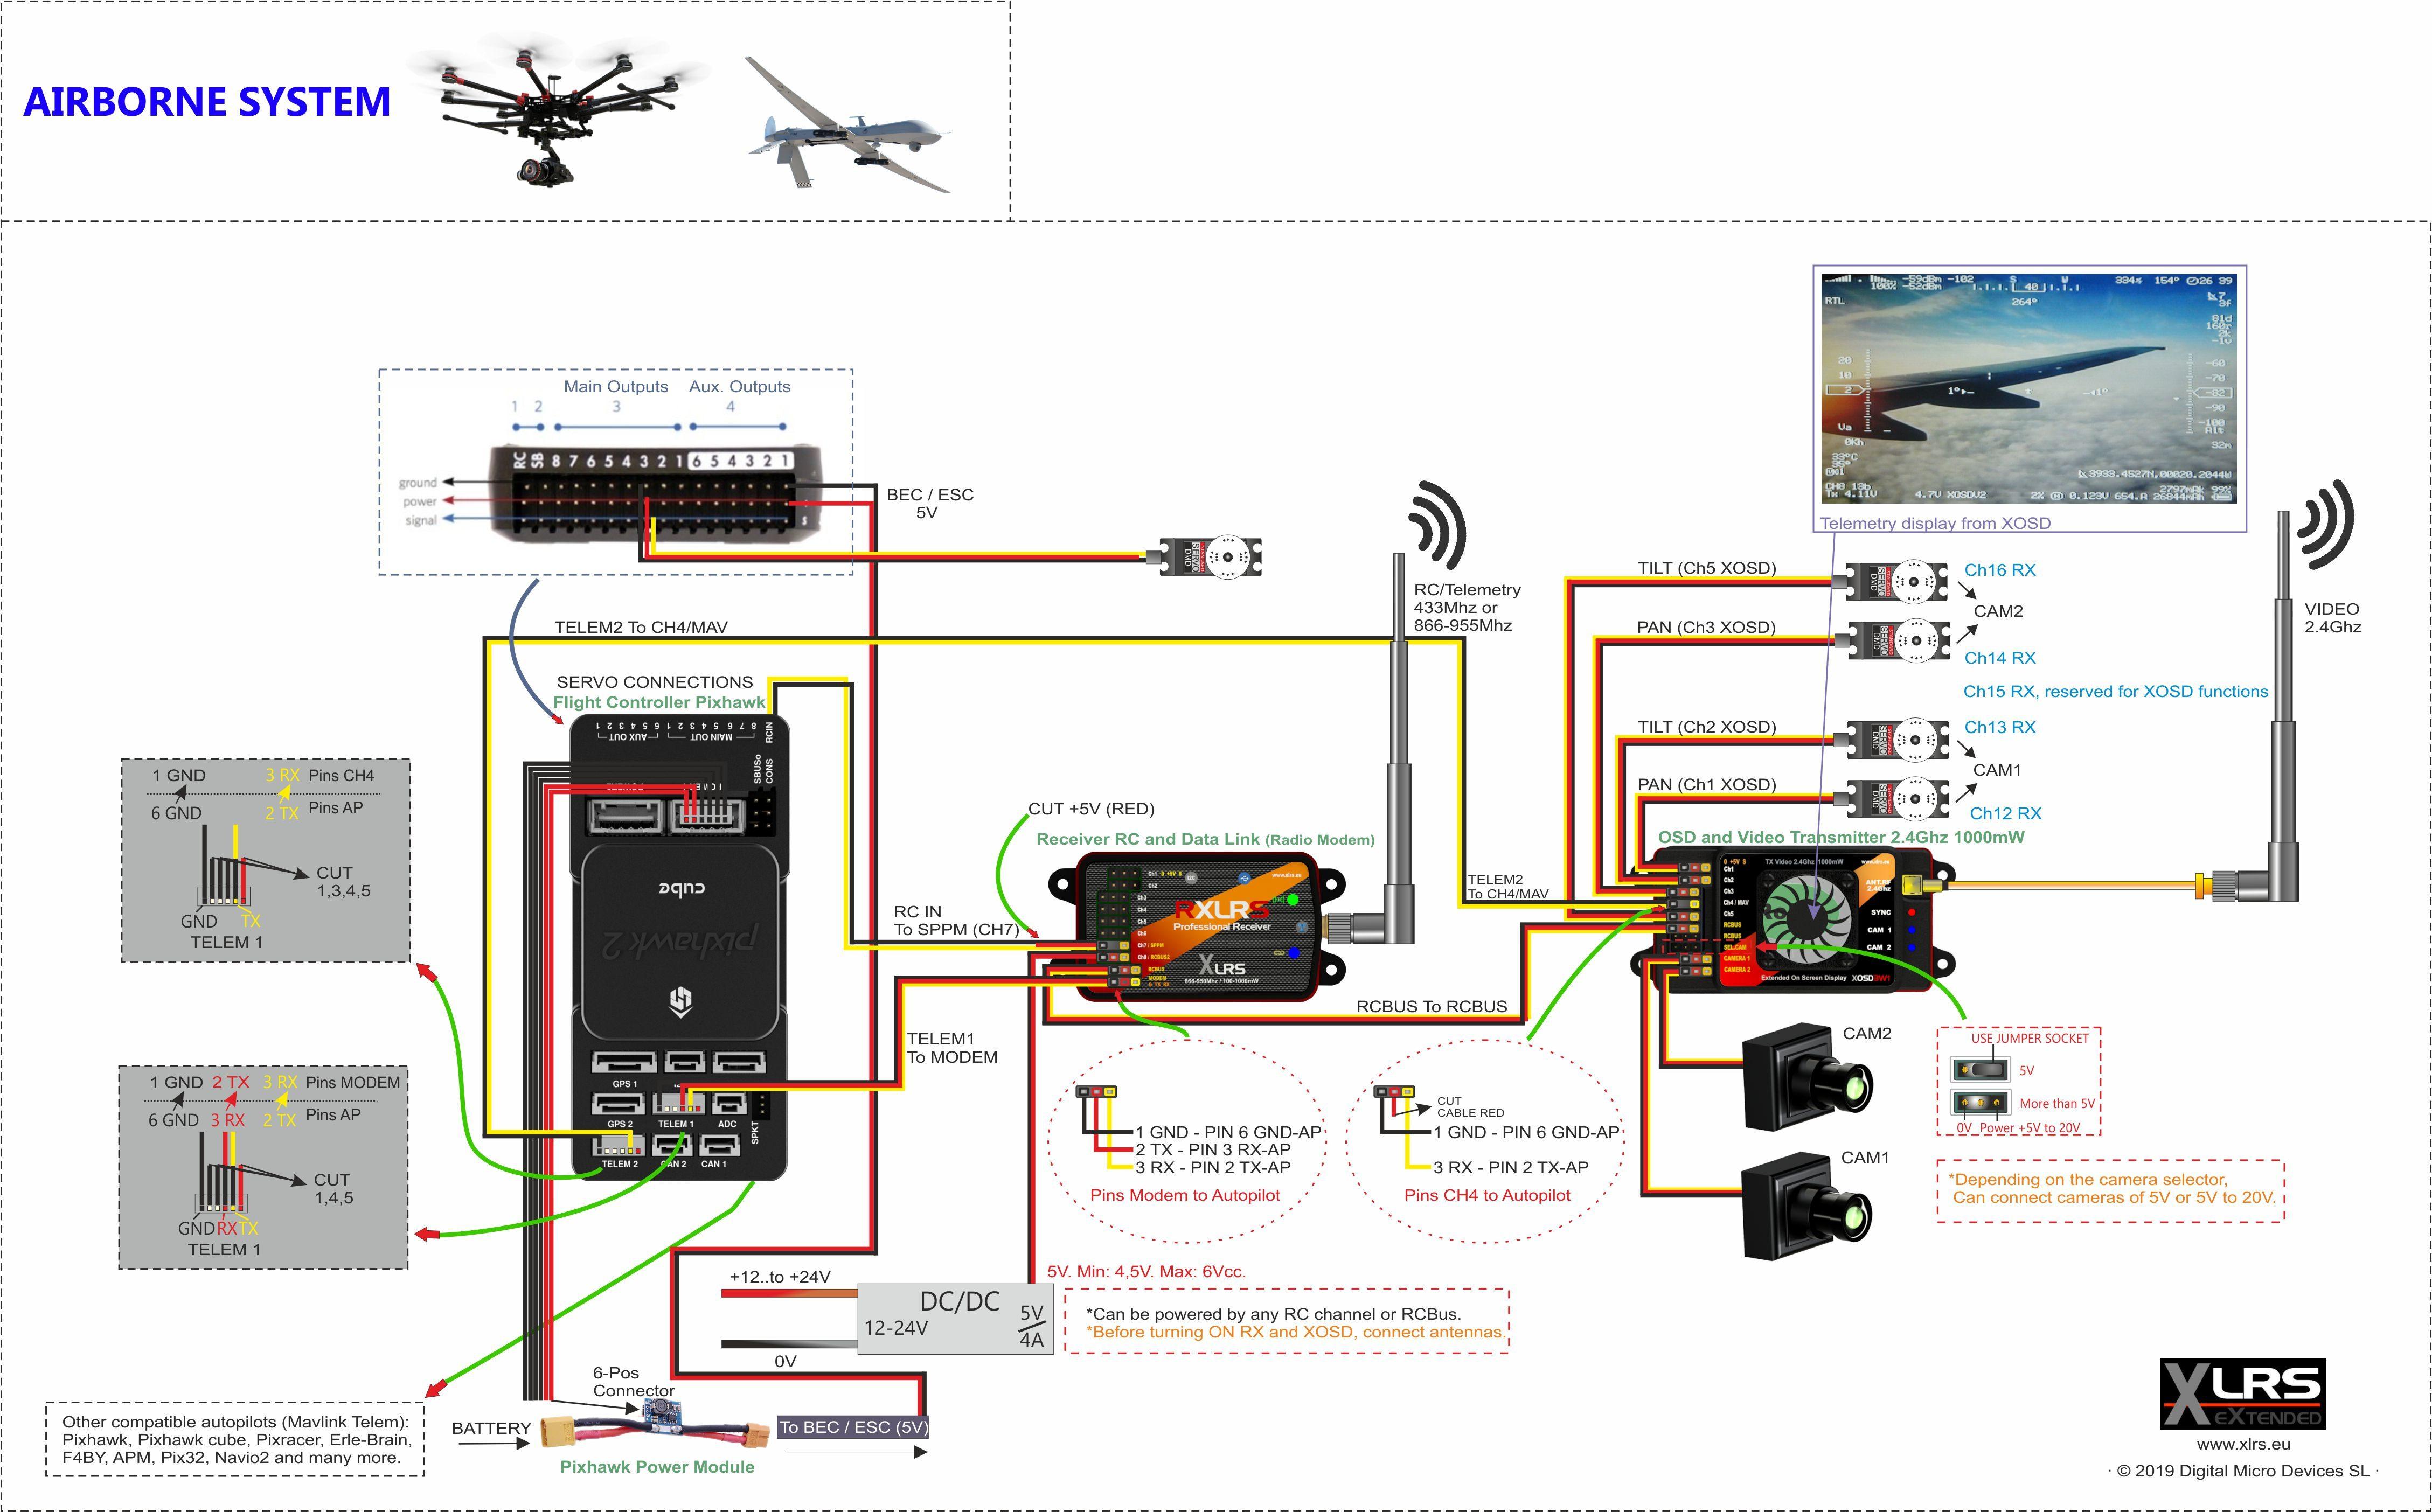 XLRS_D1 | LONG RANGE RADIO CONTROL UP TO 200KM